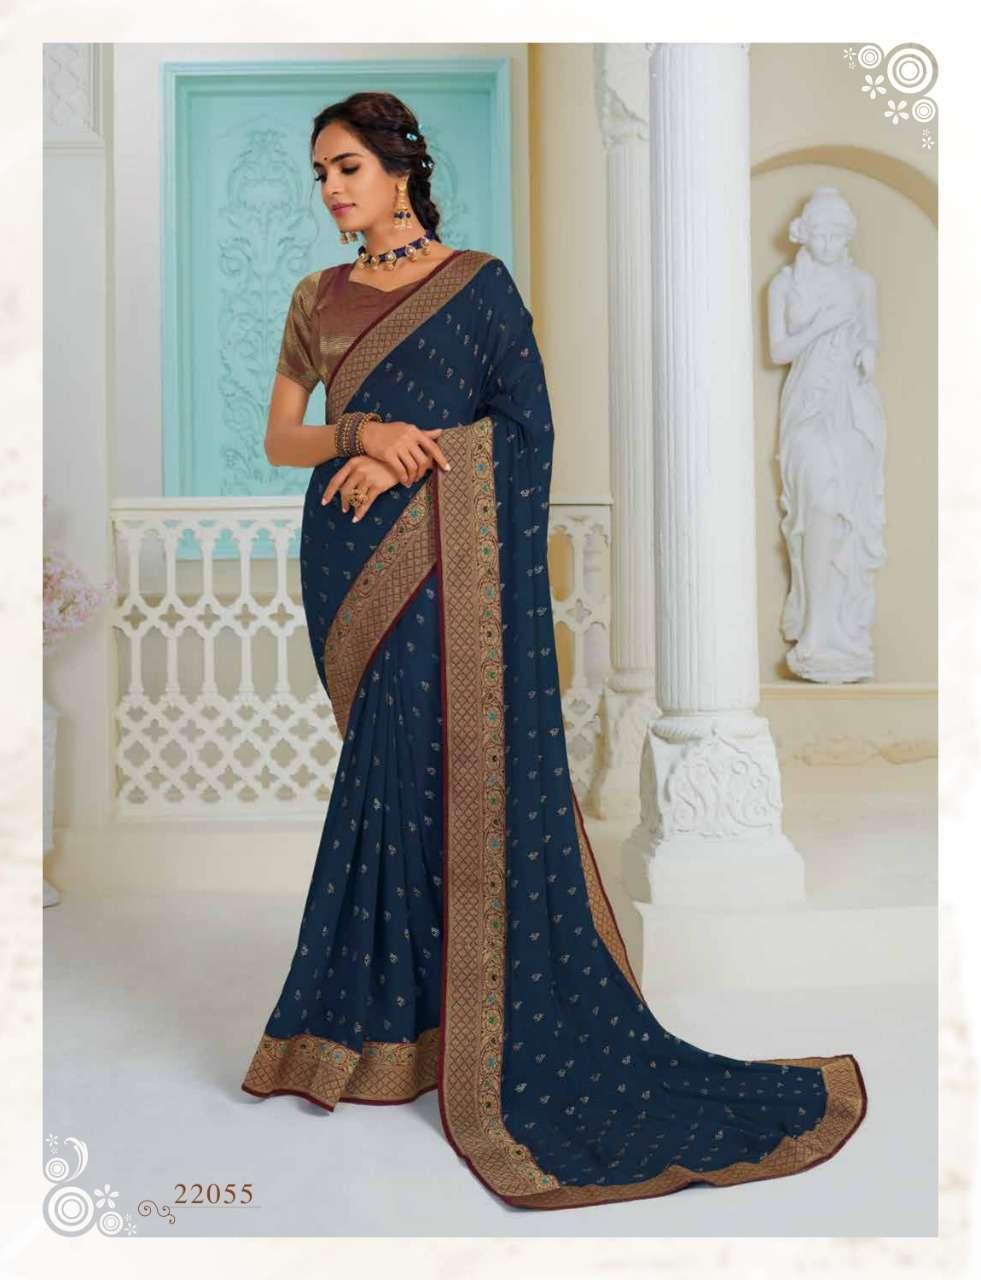 Subhash Manjri Fancy Designer Party Wear Sarees Collection 05